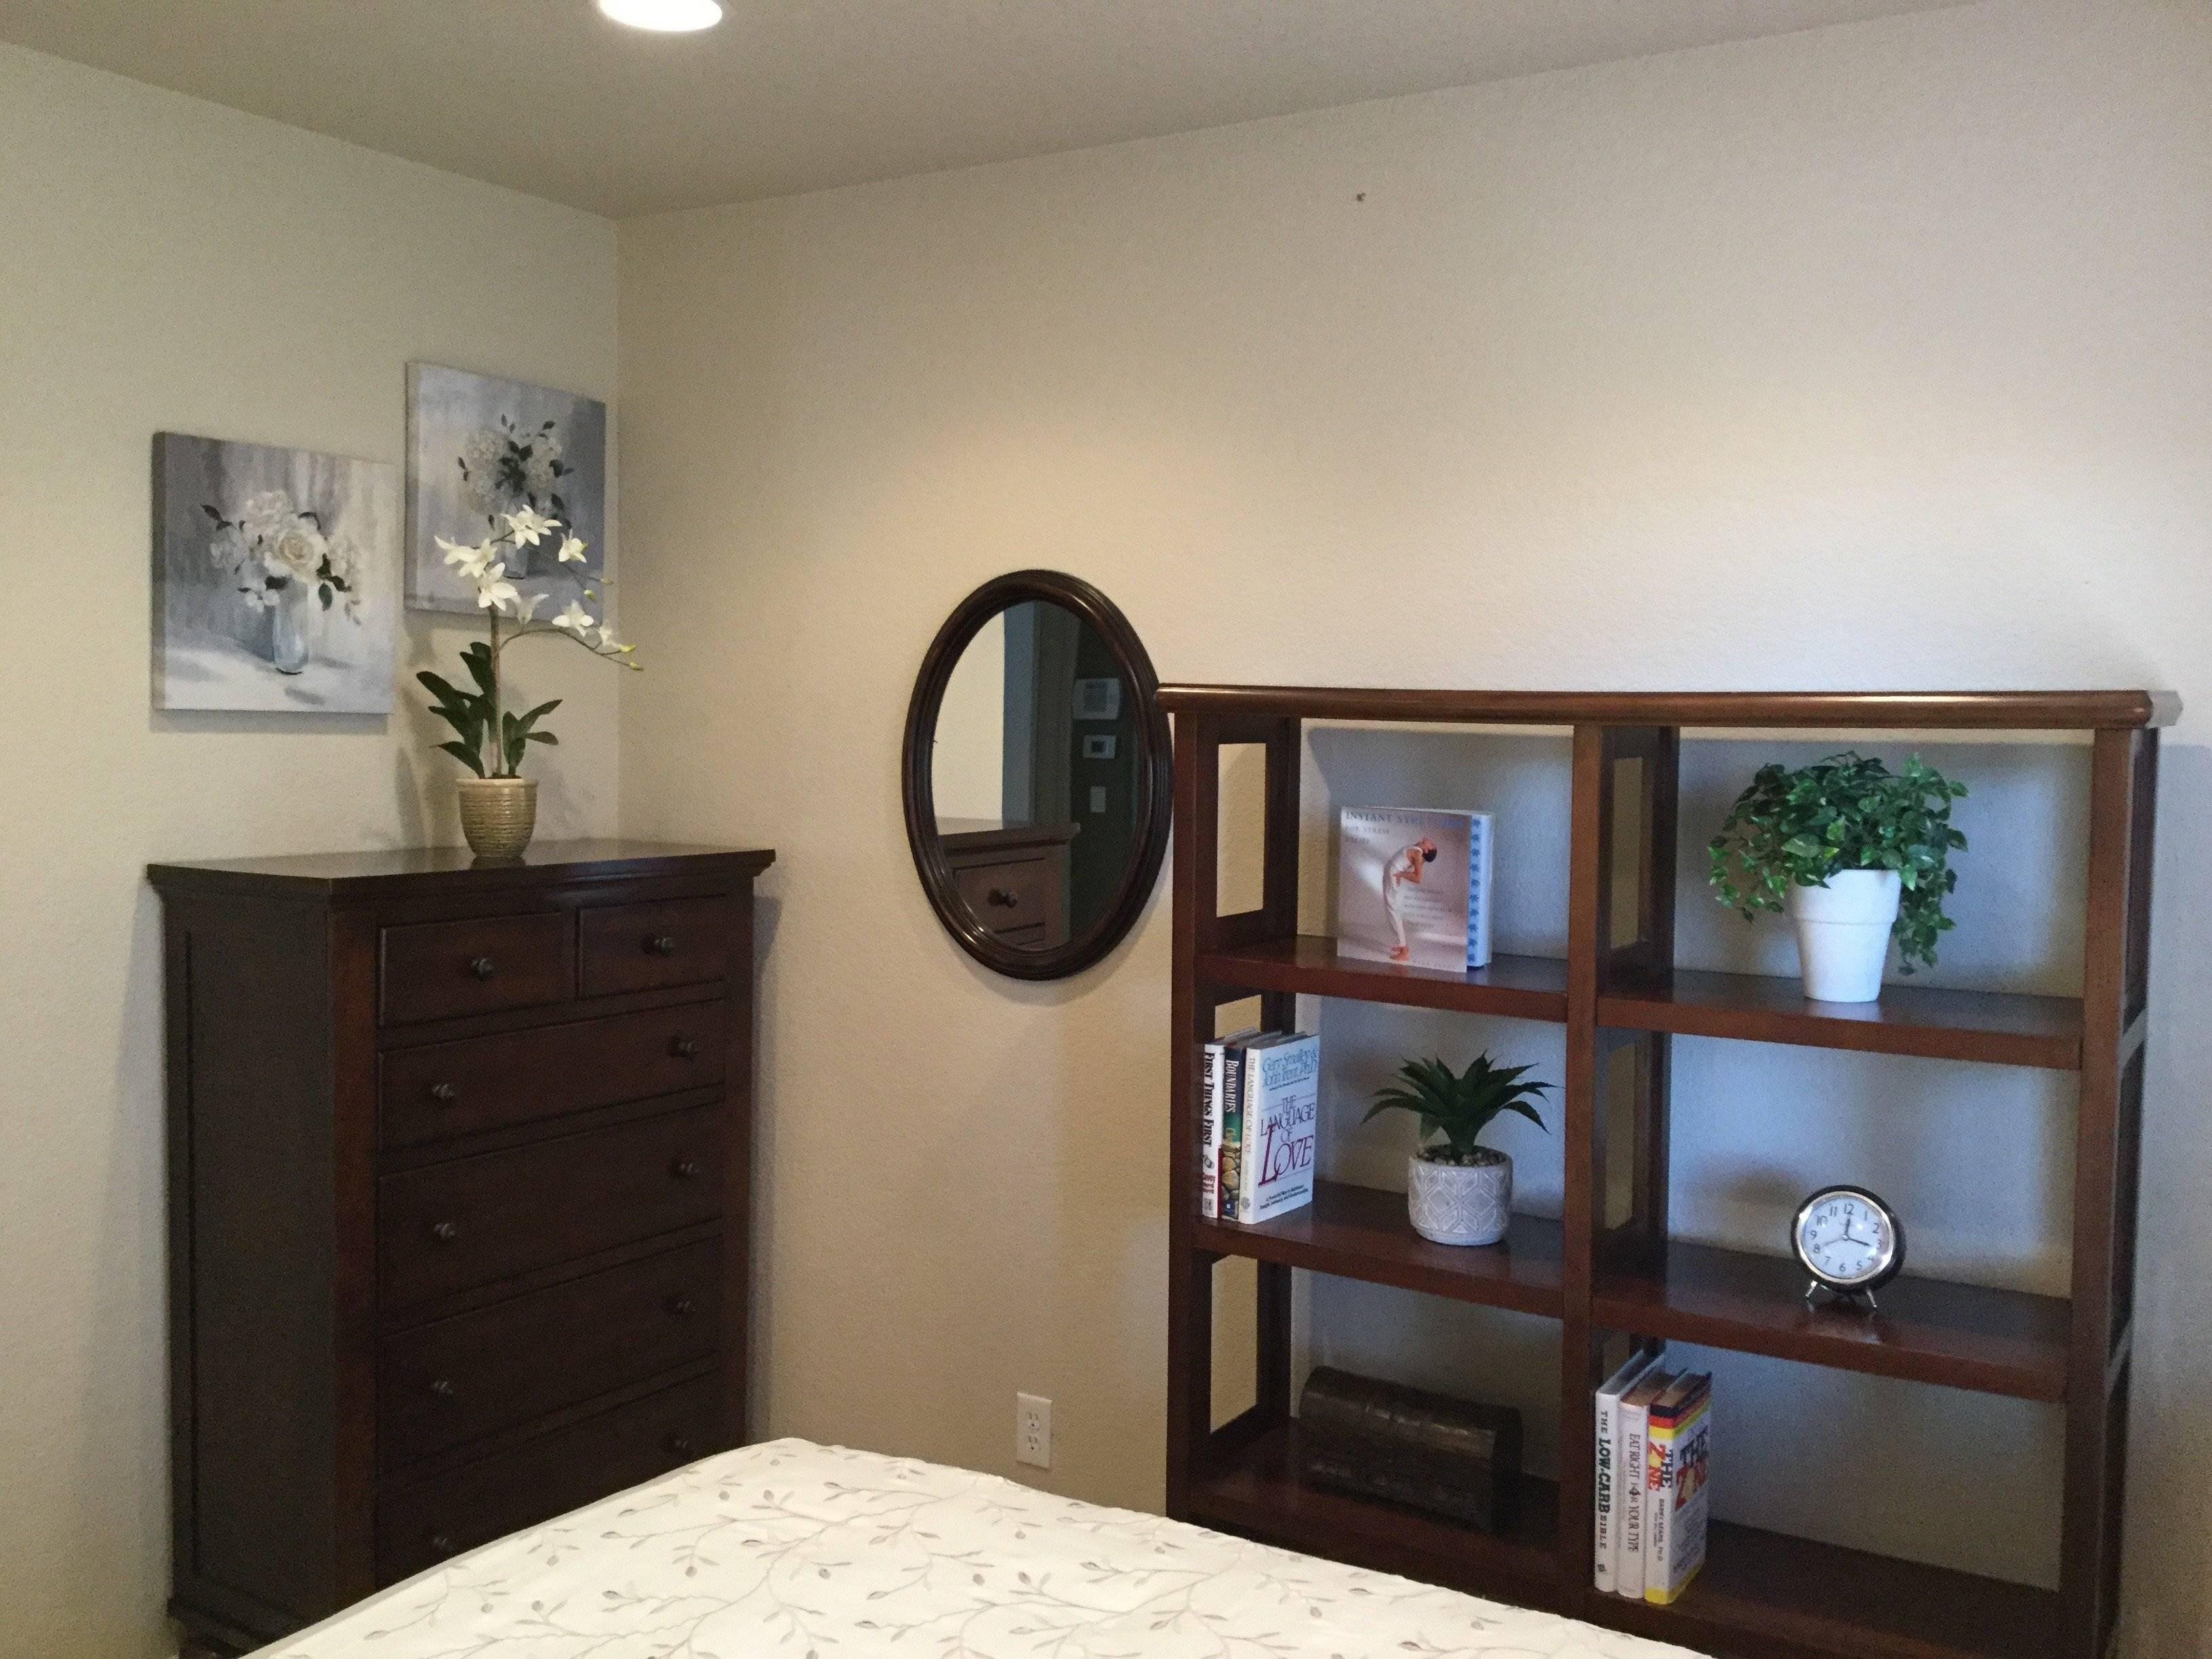 New Dresser/Nightstand